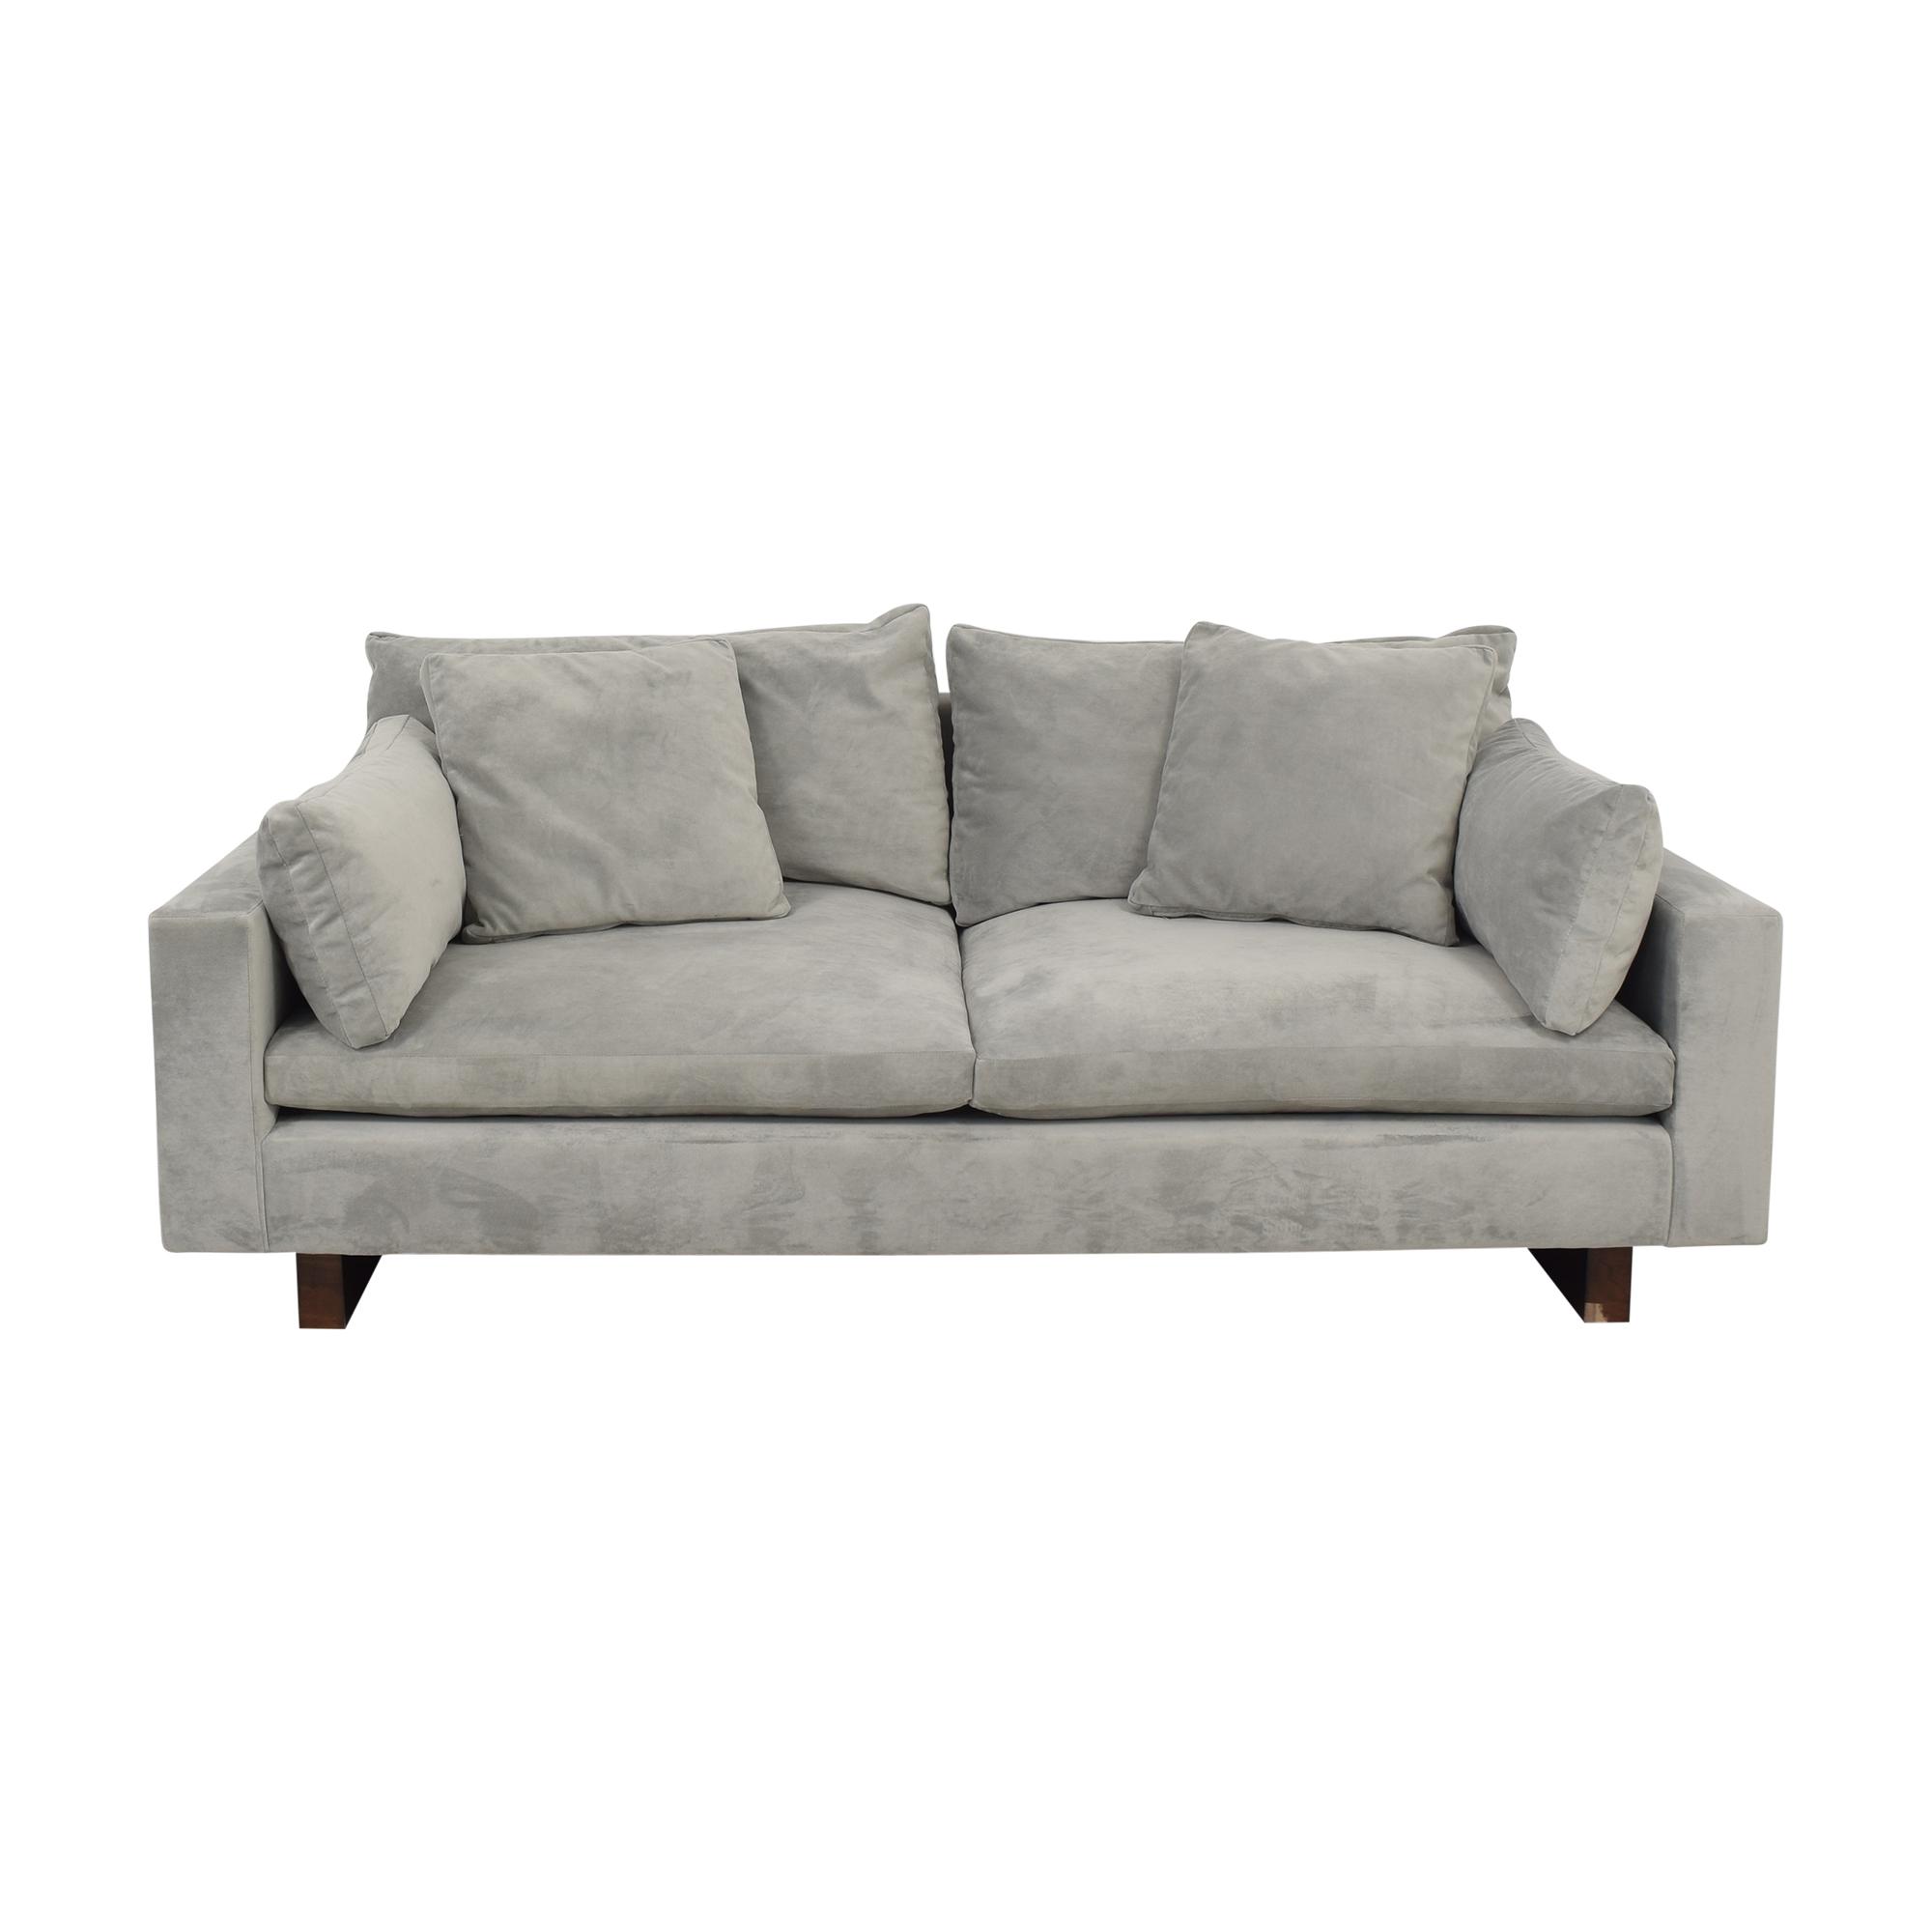 West Elm West Elm Harmony Sofa on sale